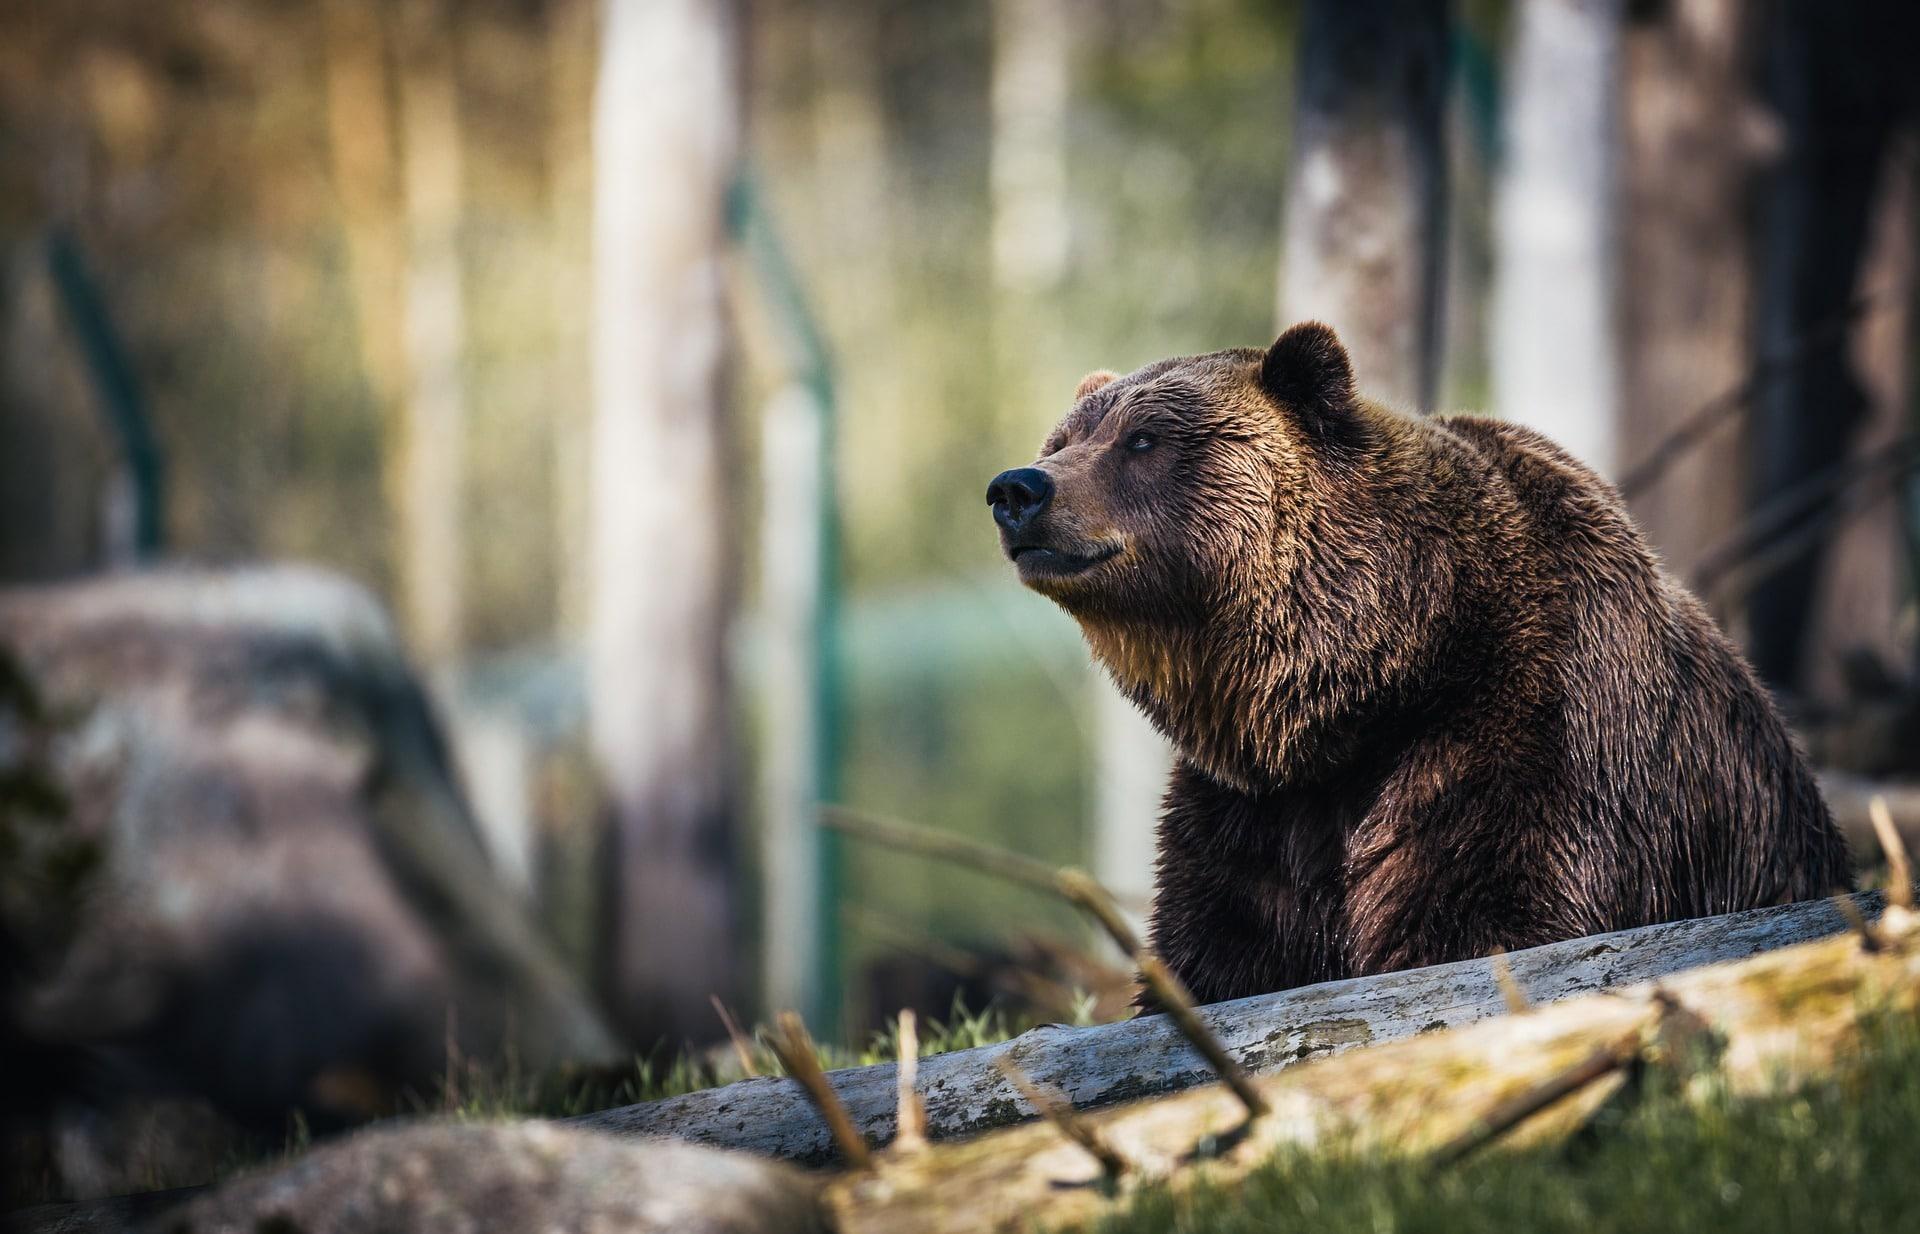 bear woods pixabay